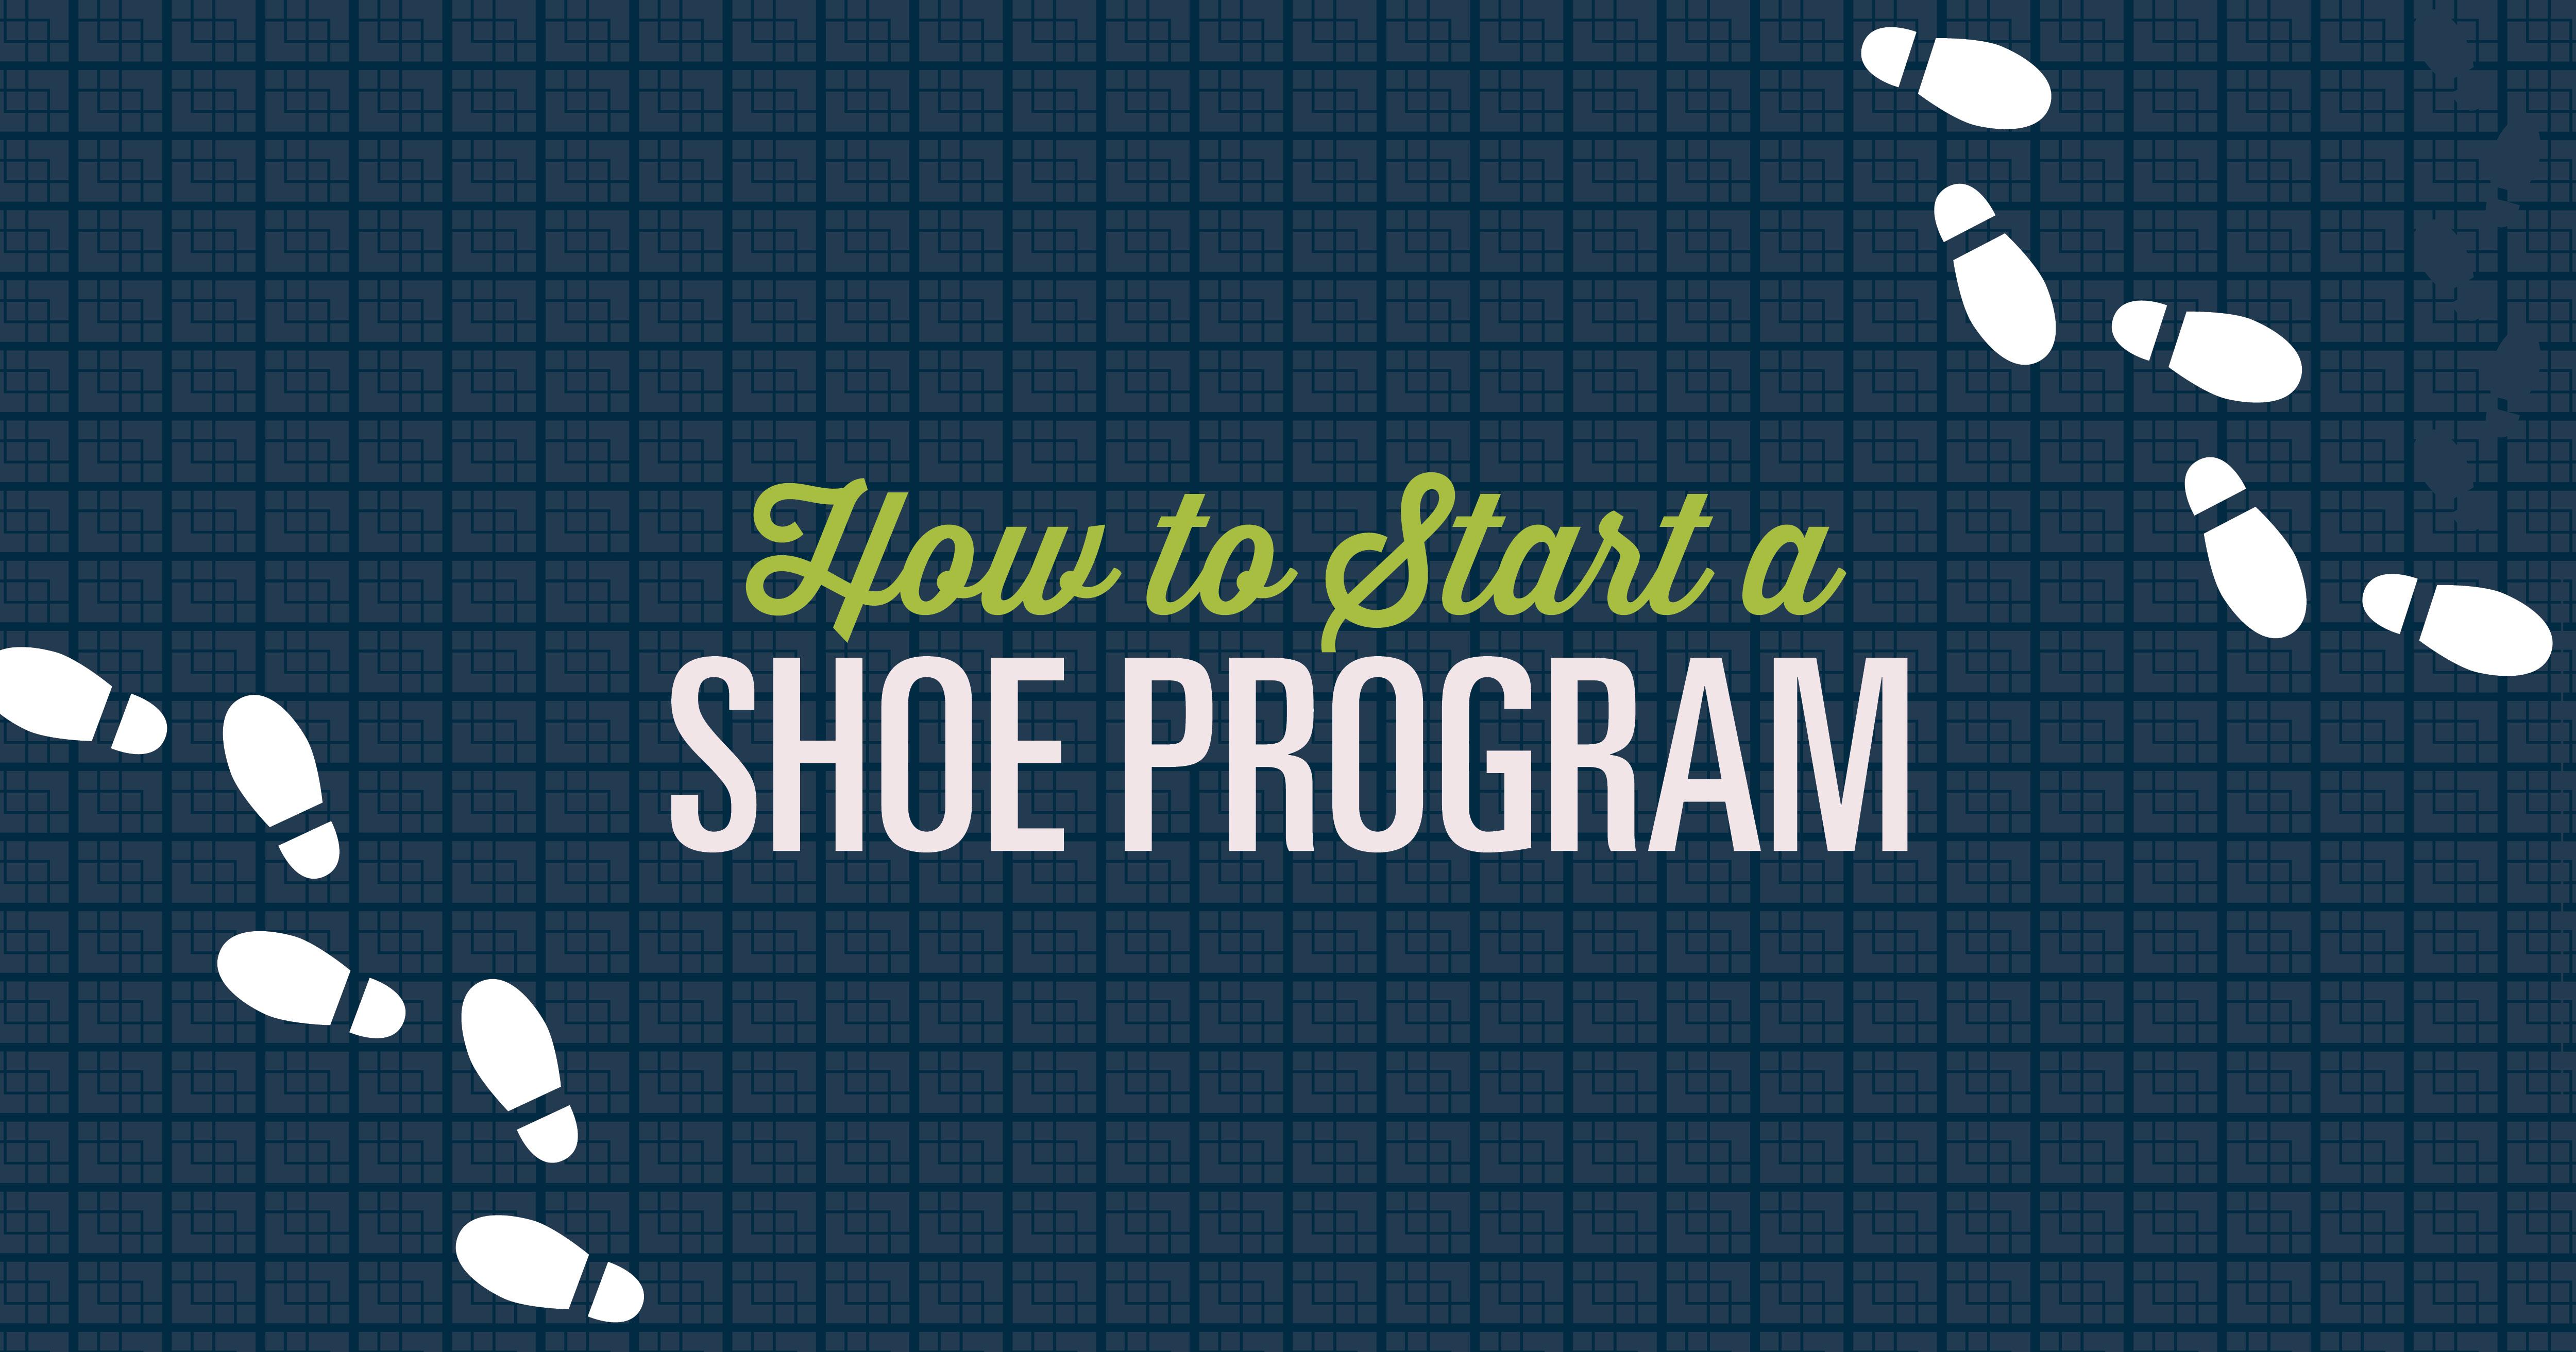 How to Start A Shoe Program 101